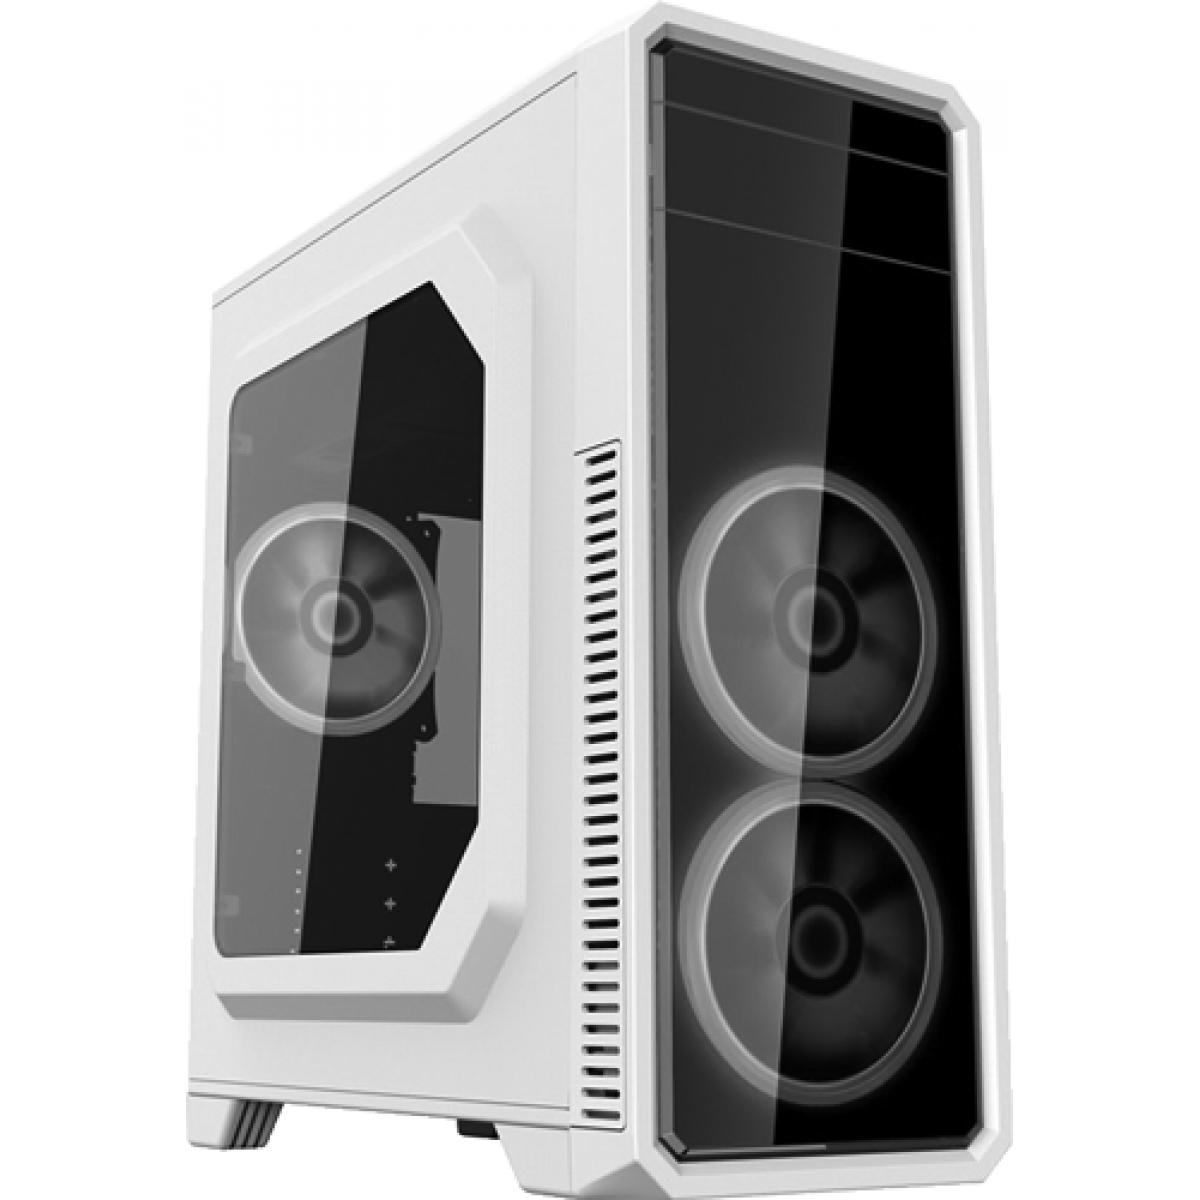 Gabinete Gamer Gamemax ECO G561 Plus Mid Tower Preto C/ LED Branco, S/Fonte, C/3 Fans